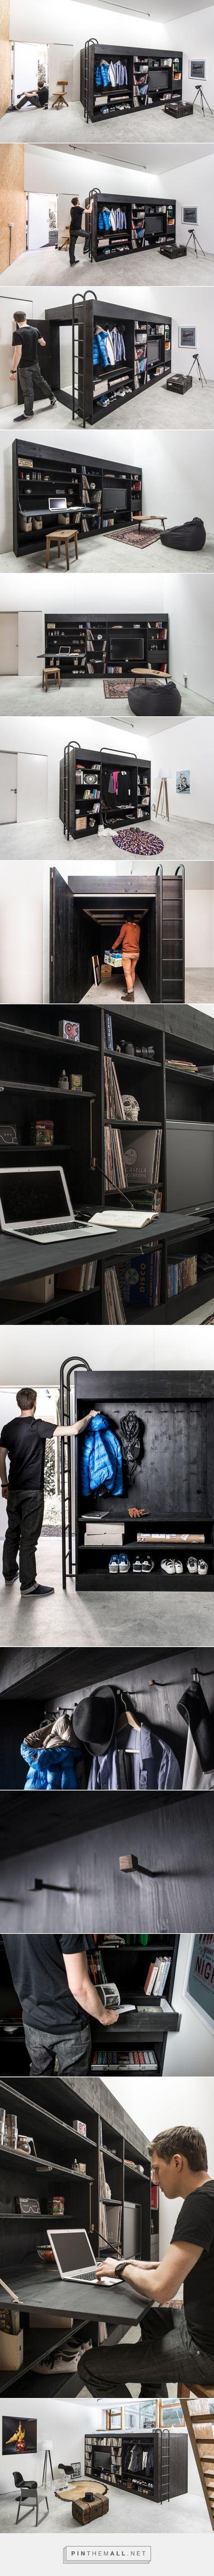 Elements modular furniture by till könneker yanko design created